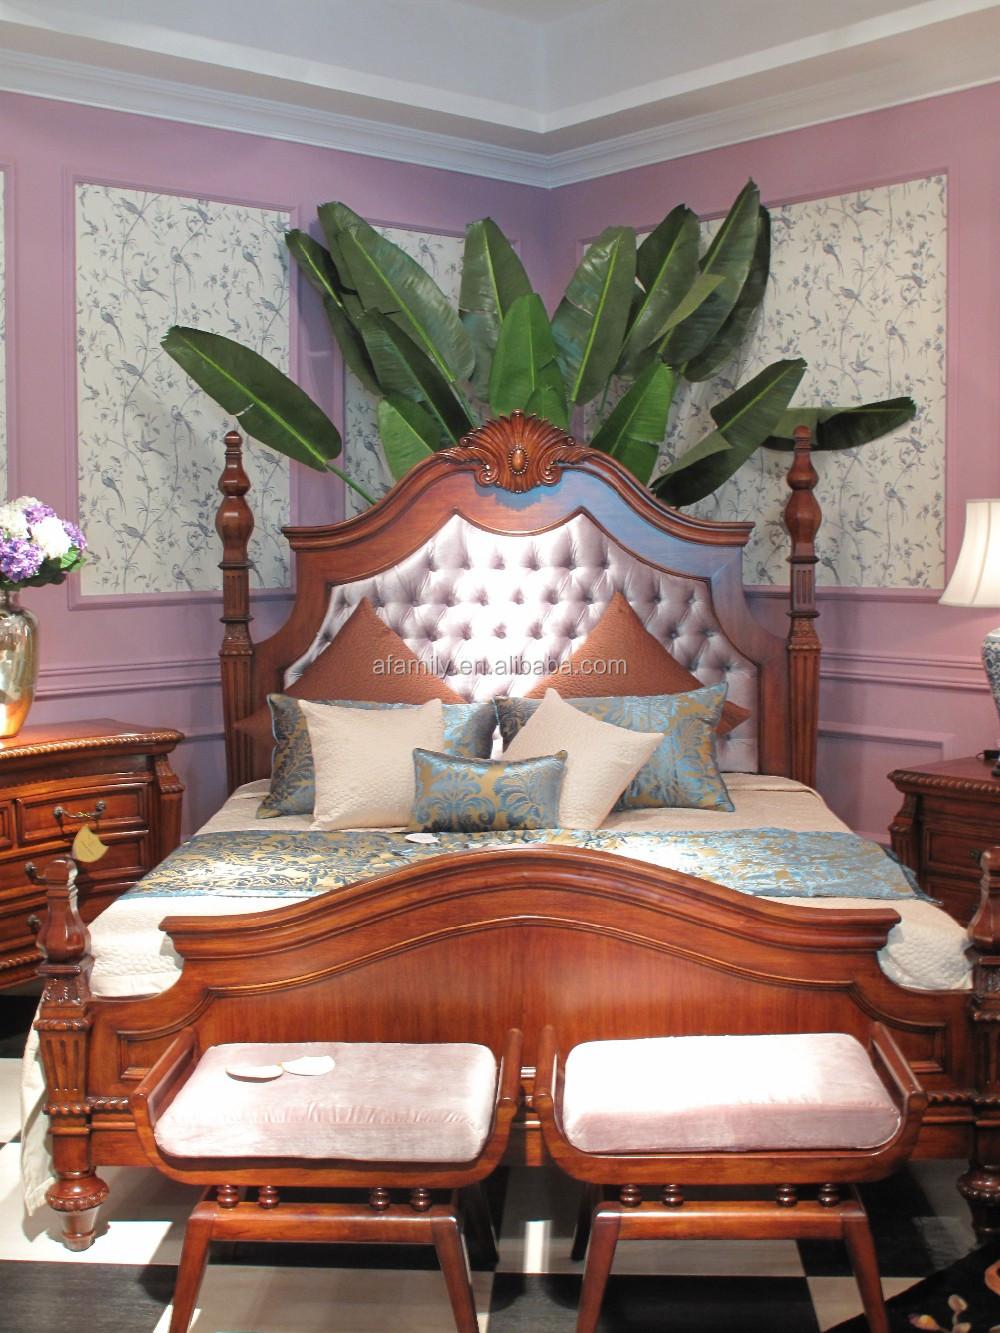 grossiste modele de lit en bois acheter les meilleurs modele de lit en bois lots de la chine. Black Bedroom Furniture Sets. Home Design Ideas